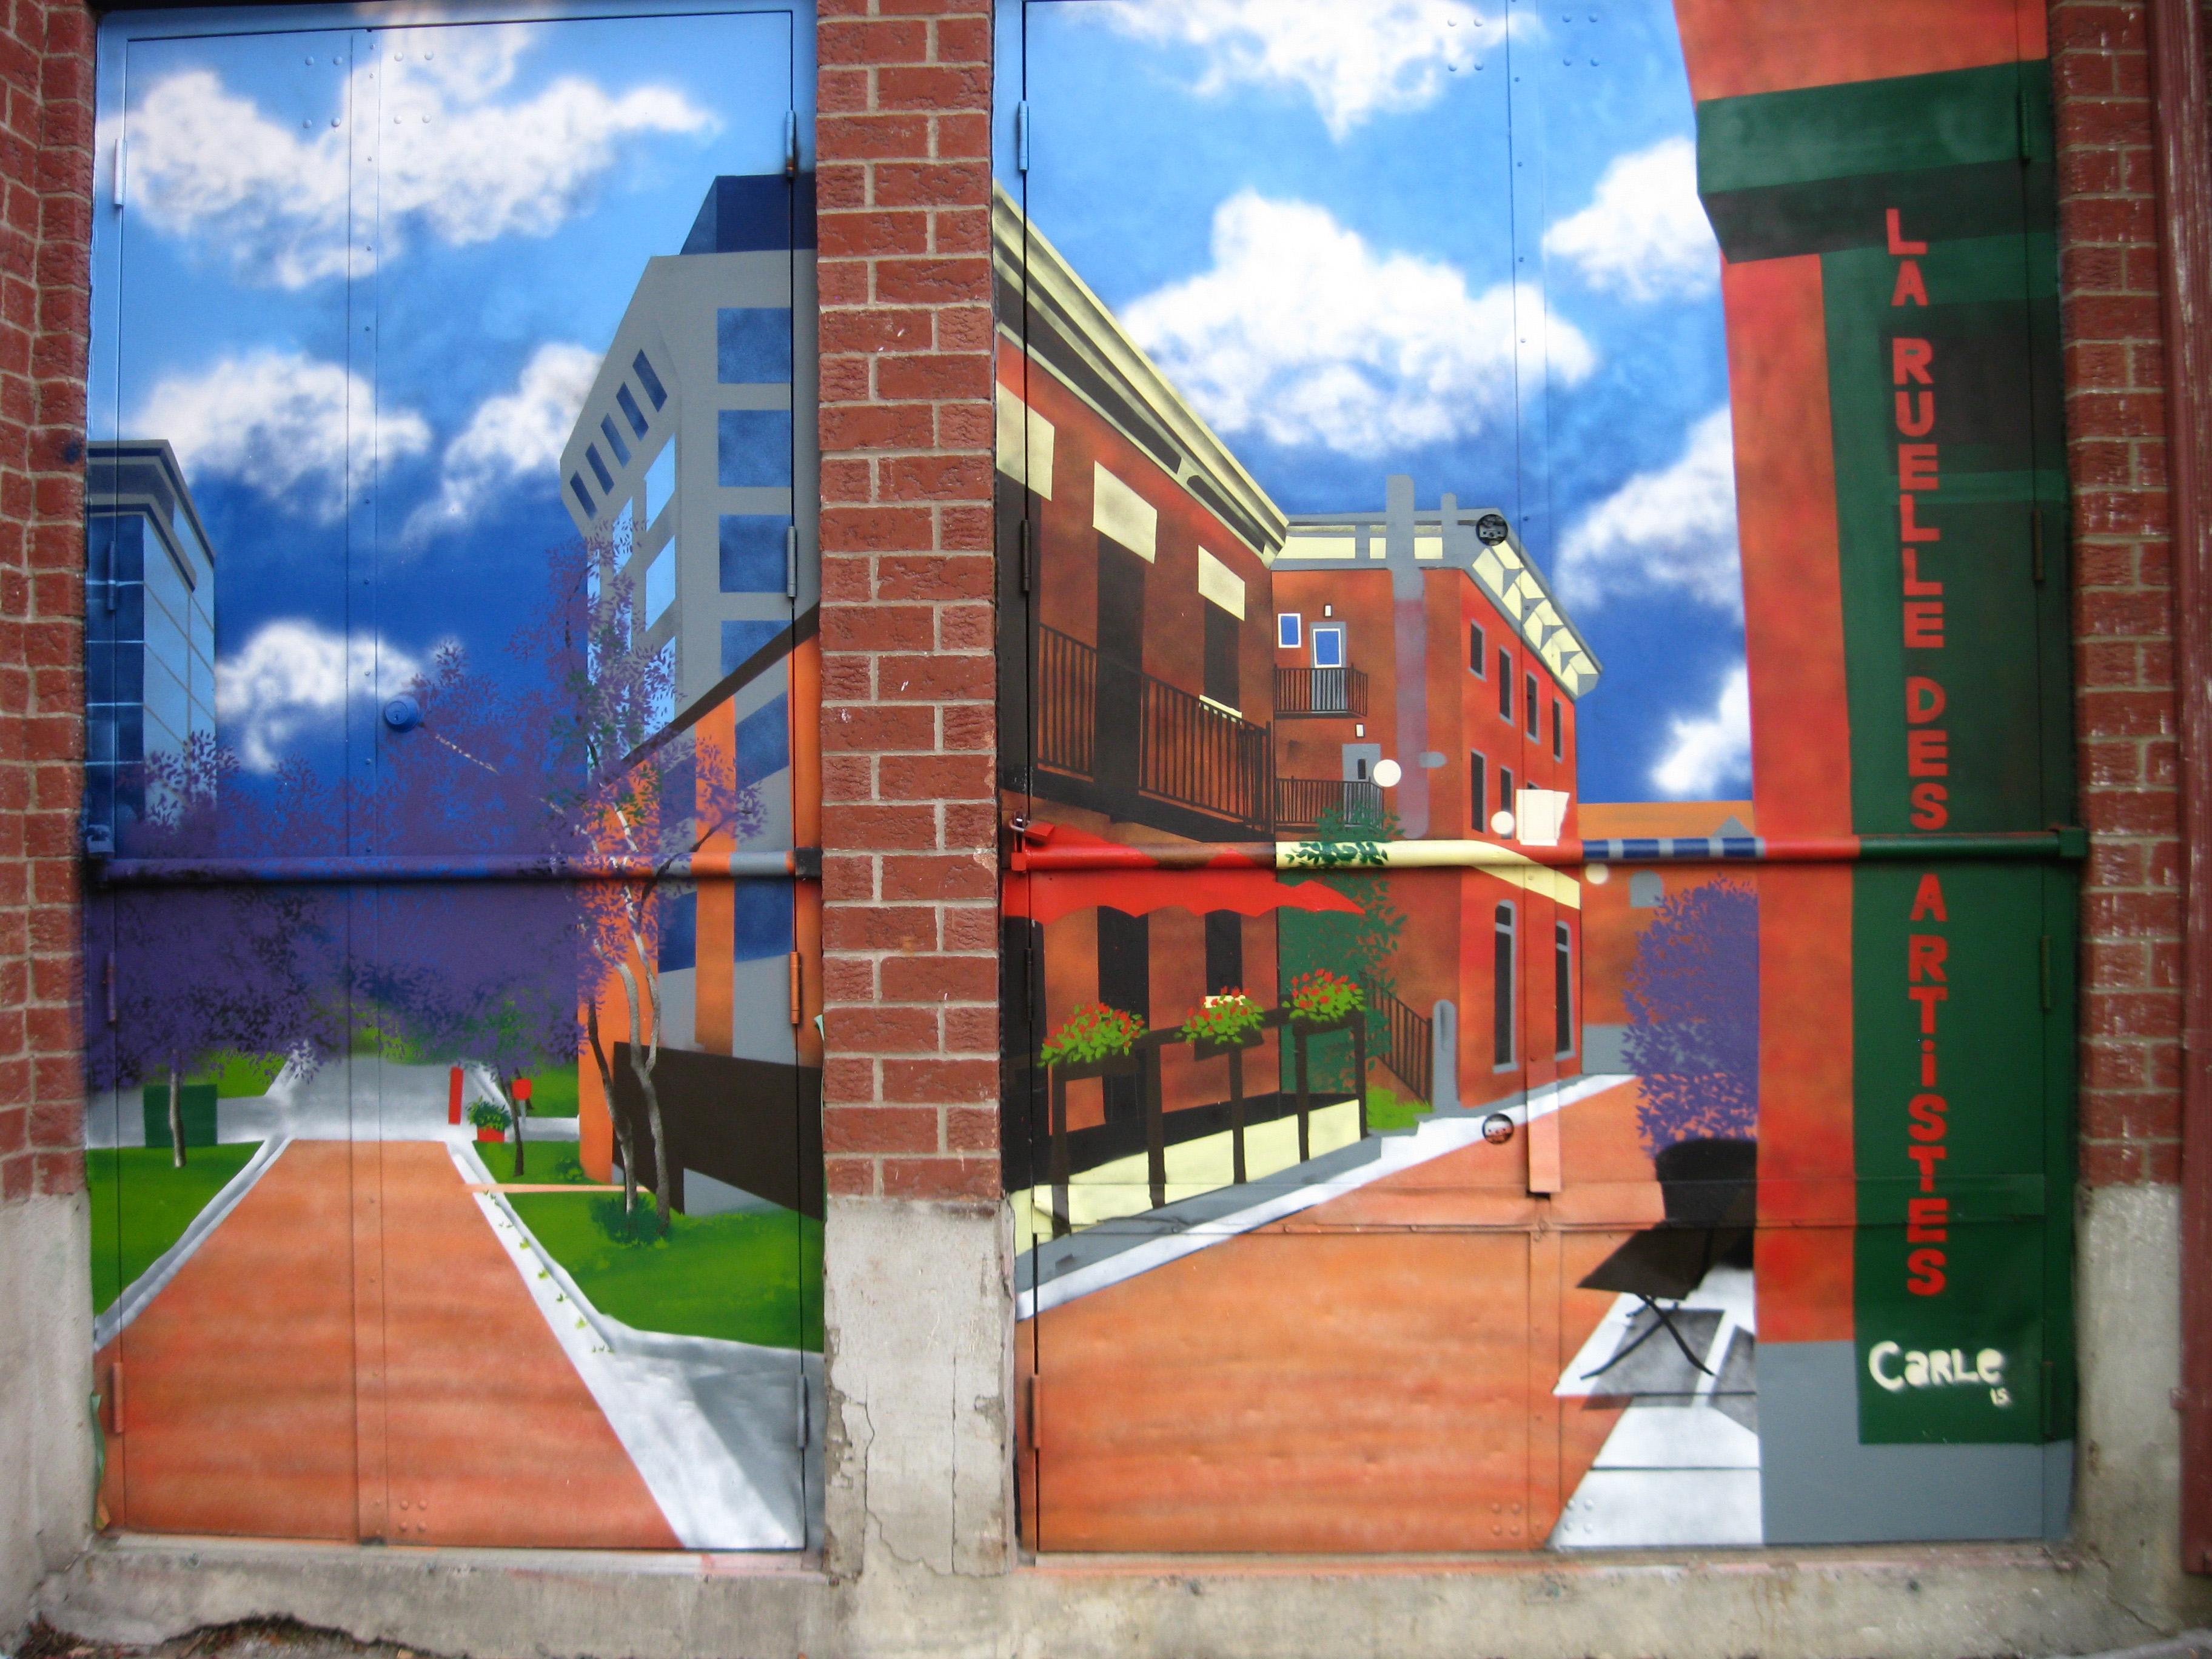 Carle amyot, la ruelle des artistes5